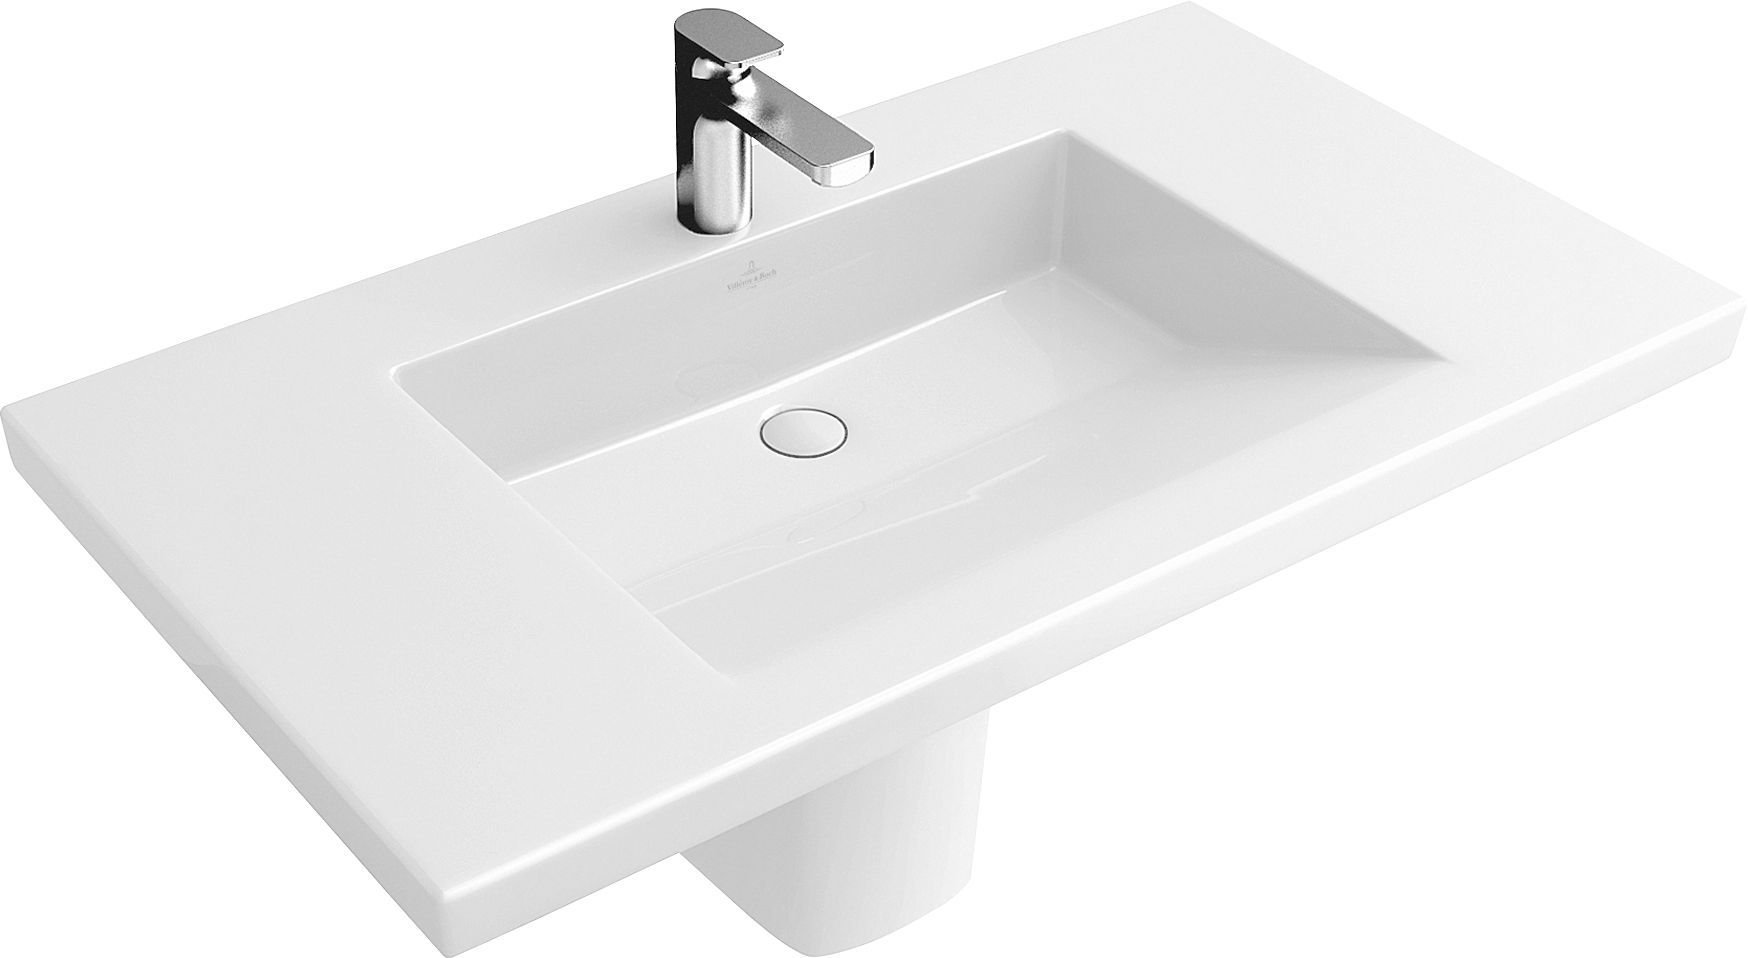 Villeroy & Boch Sentique Ablaufhaube starwhite ceramicplus 524400R2